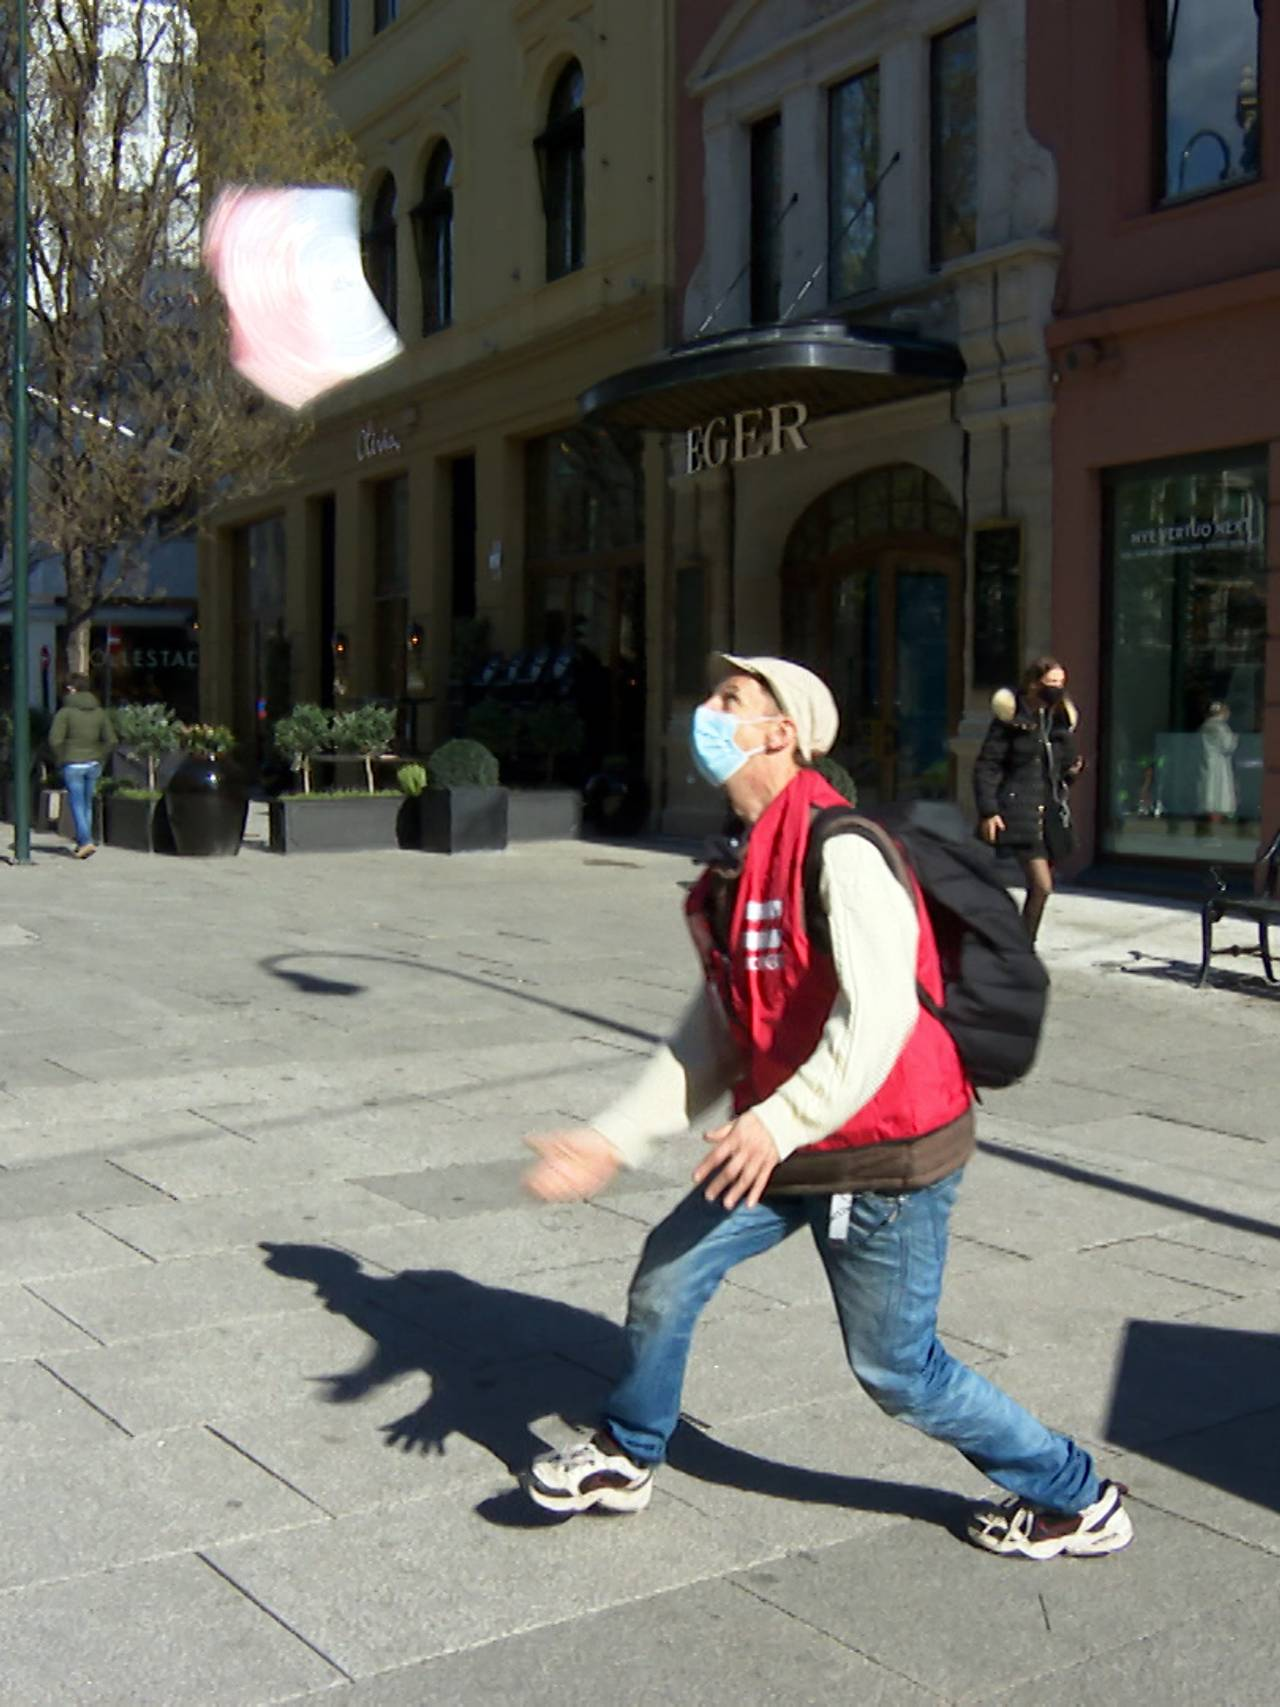 Erlik Oslo-selger Sondre kaster et magasin i luften